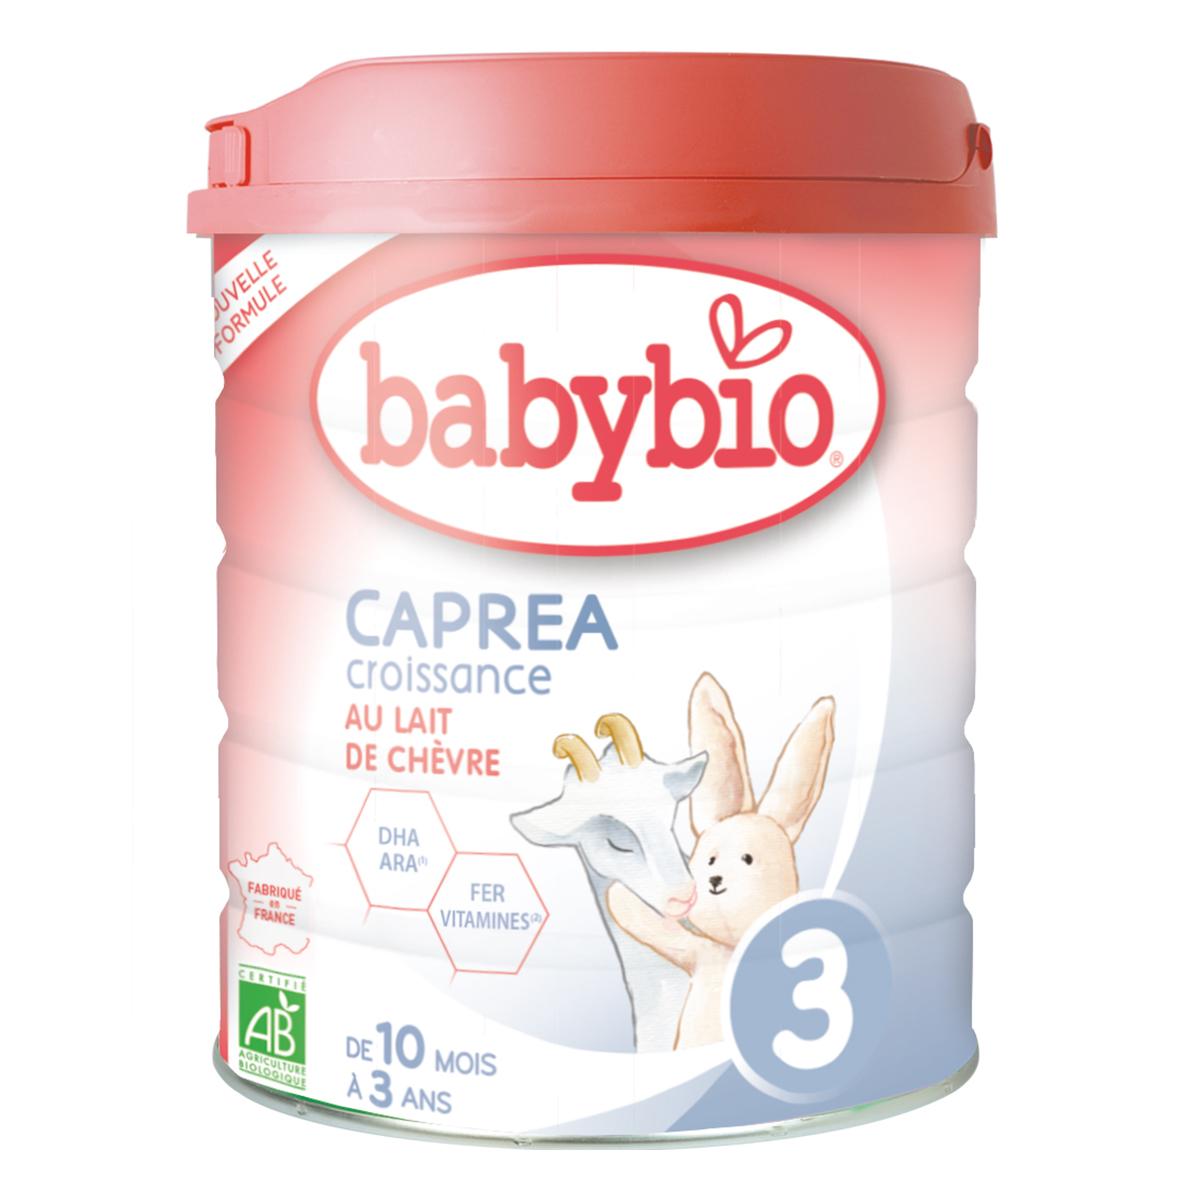 babybio 58053 1108009